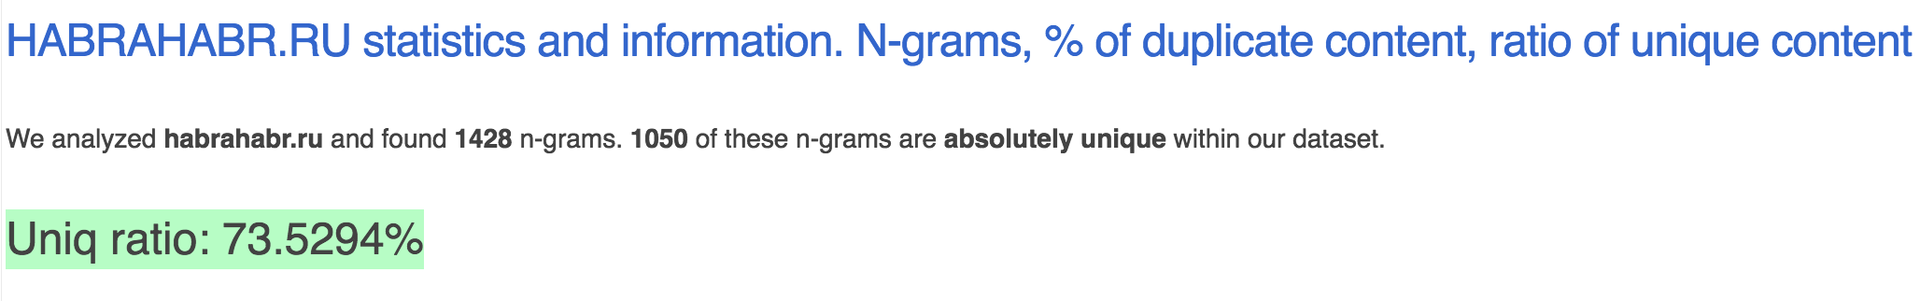 Пересечение морд доменов топ 1,000,000 по N-граммам - 6